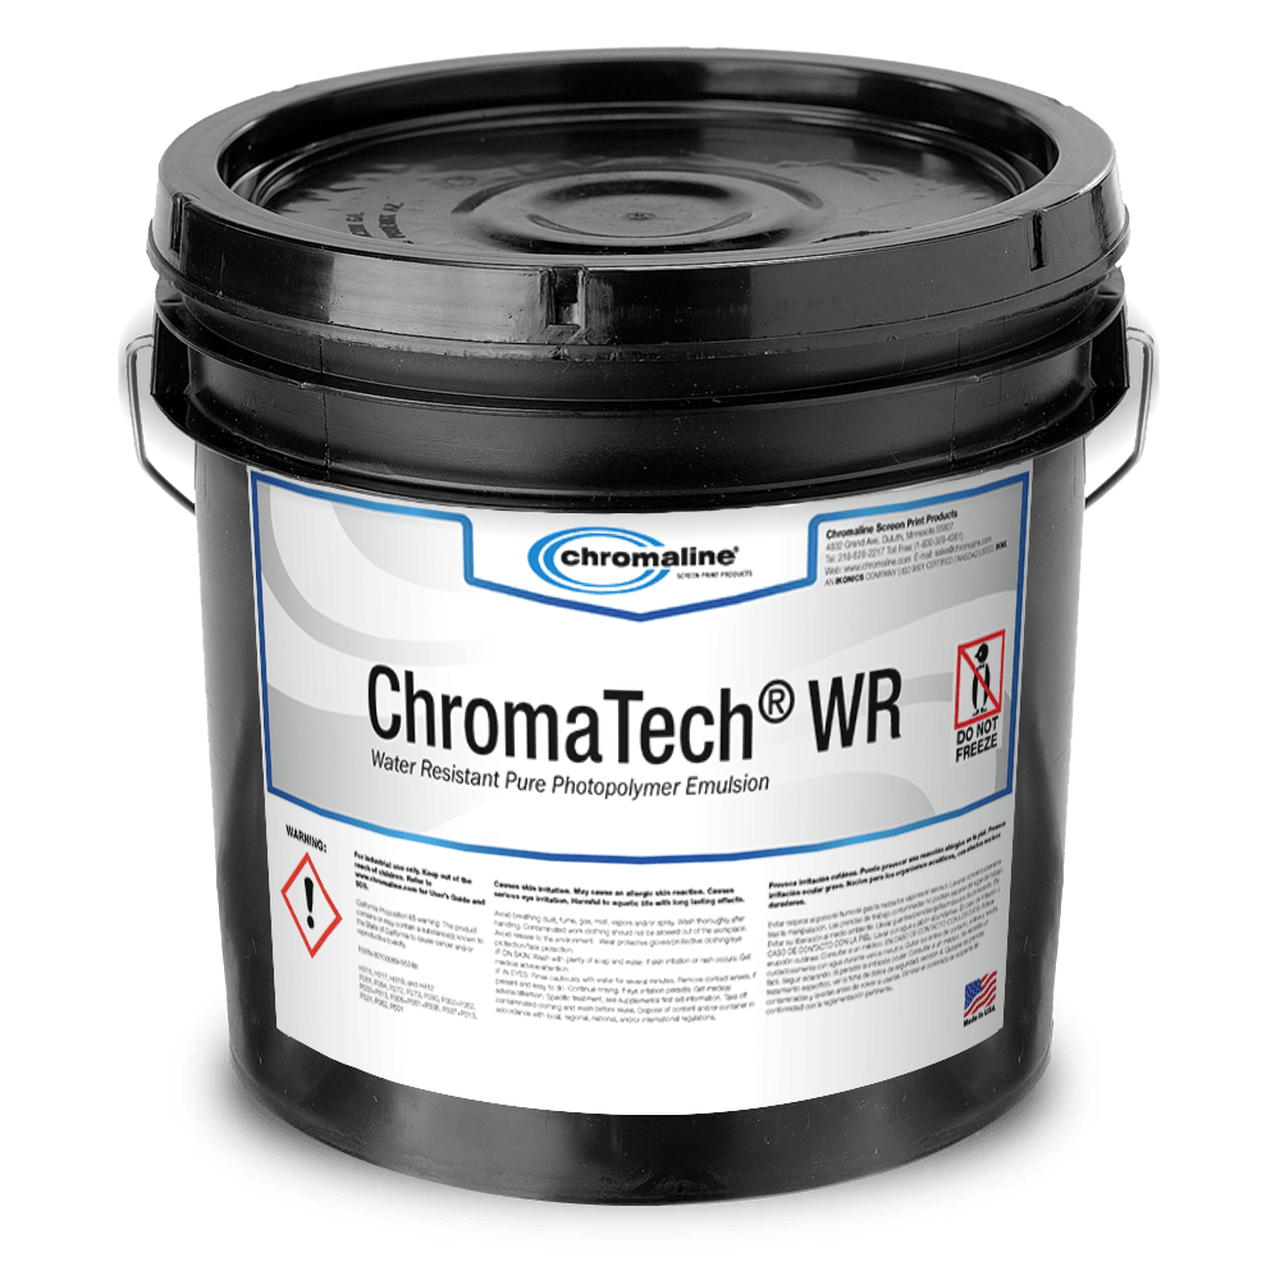 chromatech wr water resistant emulsion